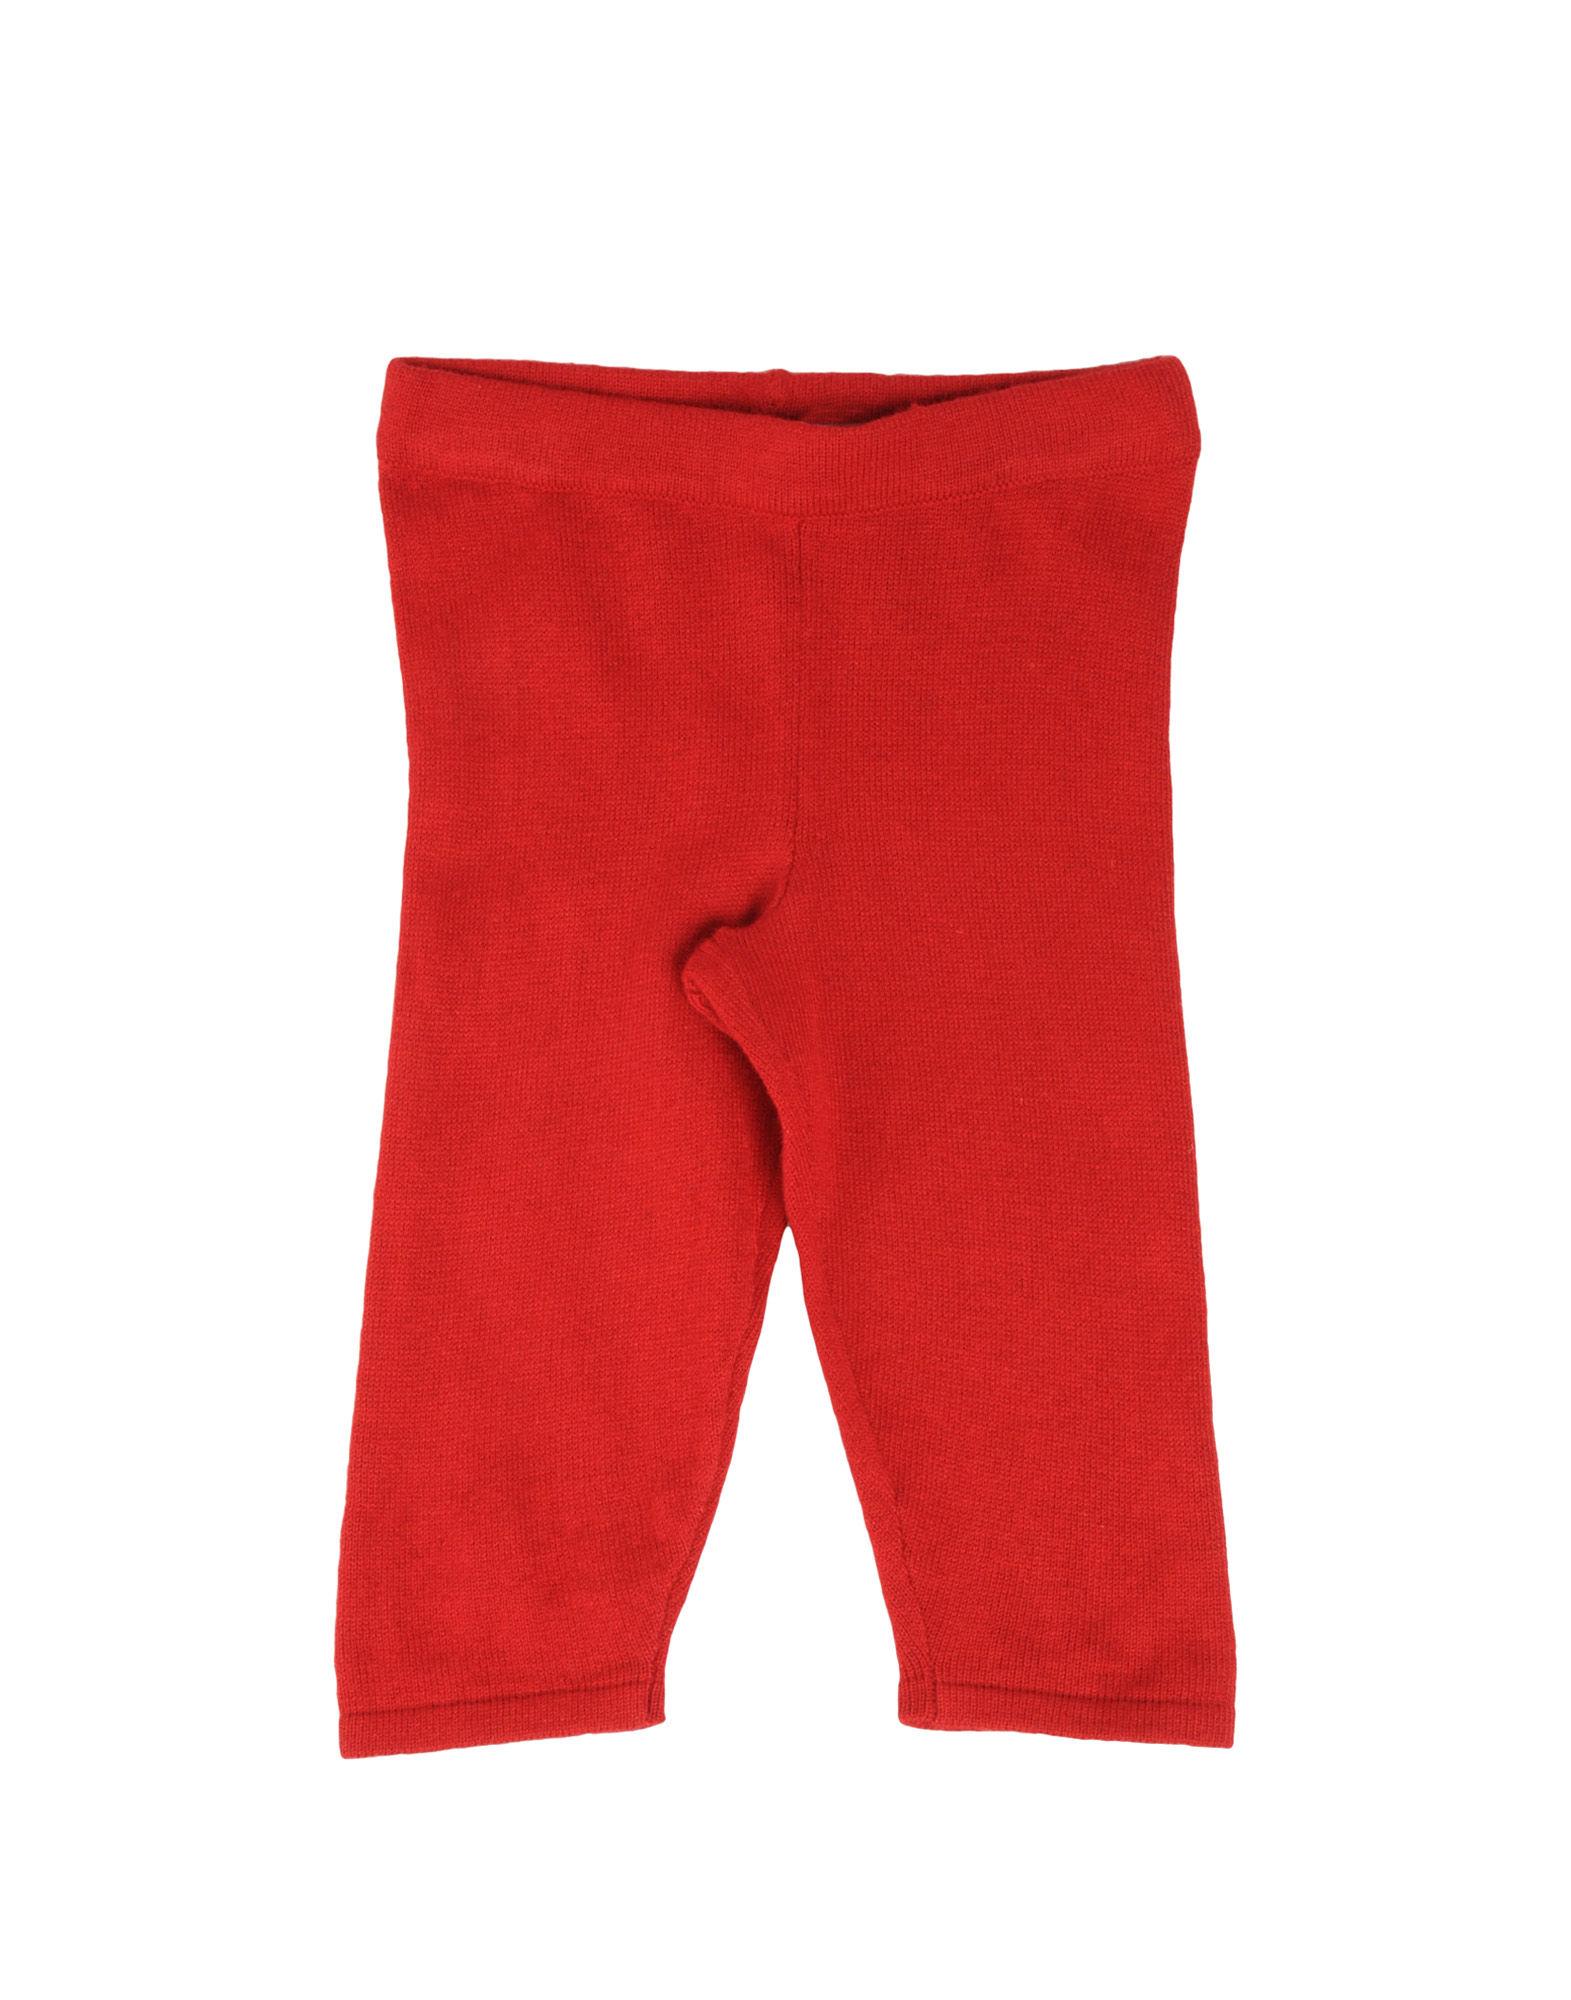 Gf Ferre' Kids' Casual Pants In Red